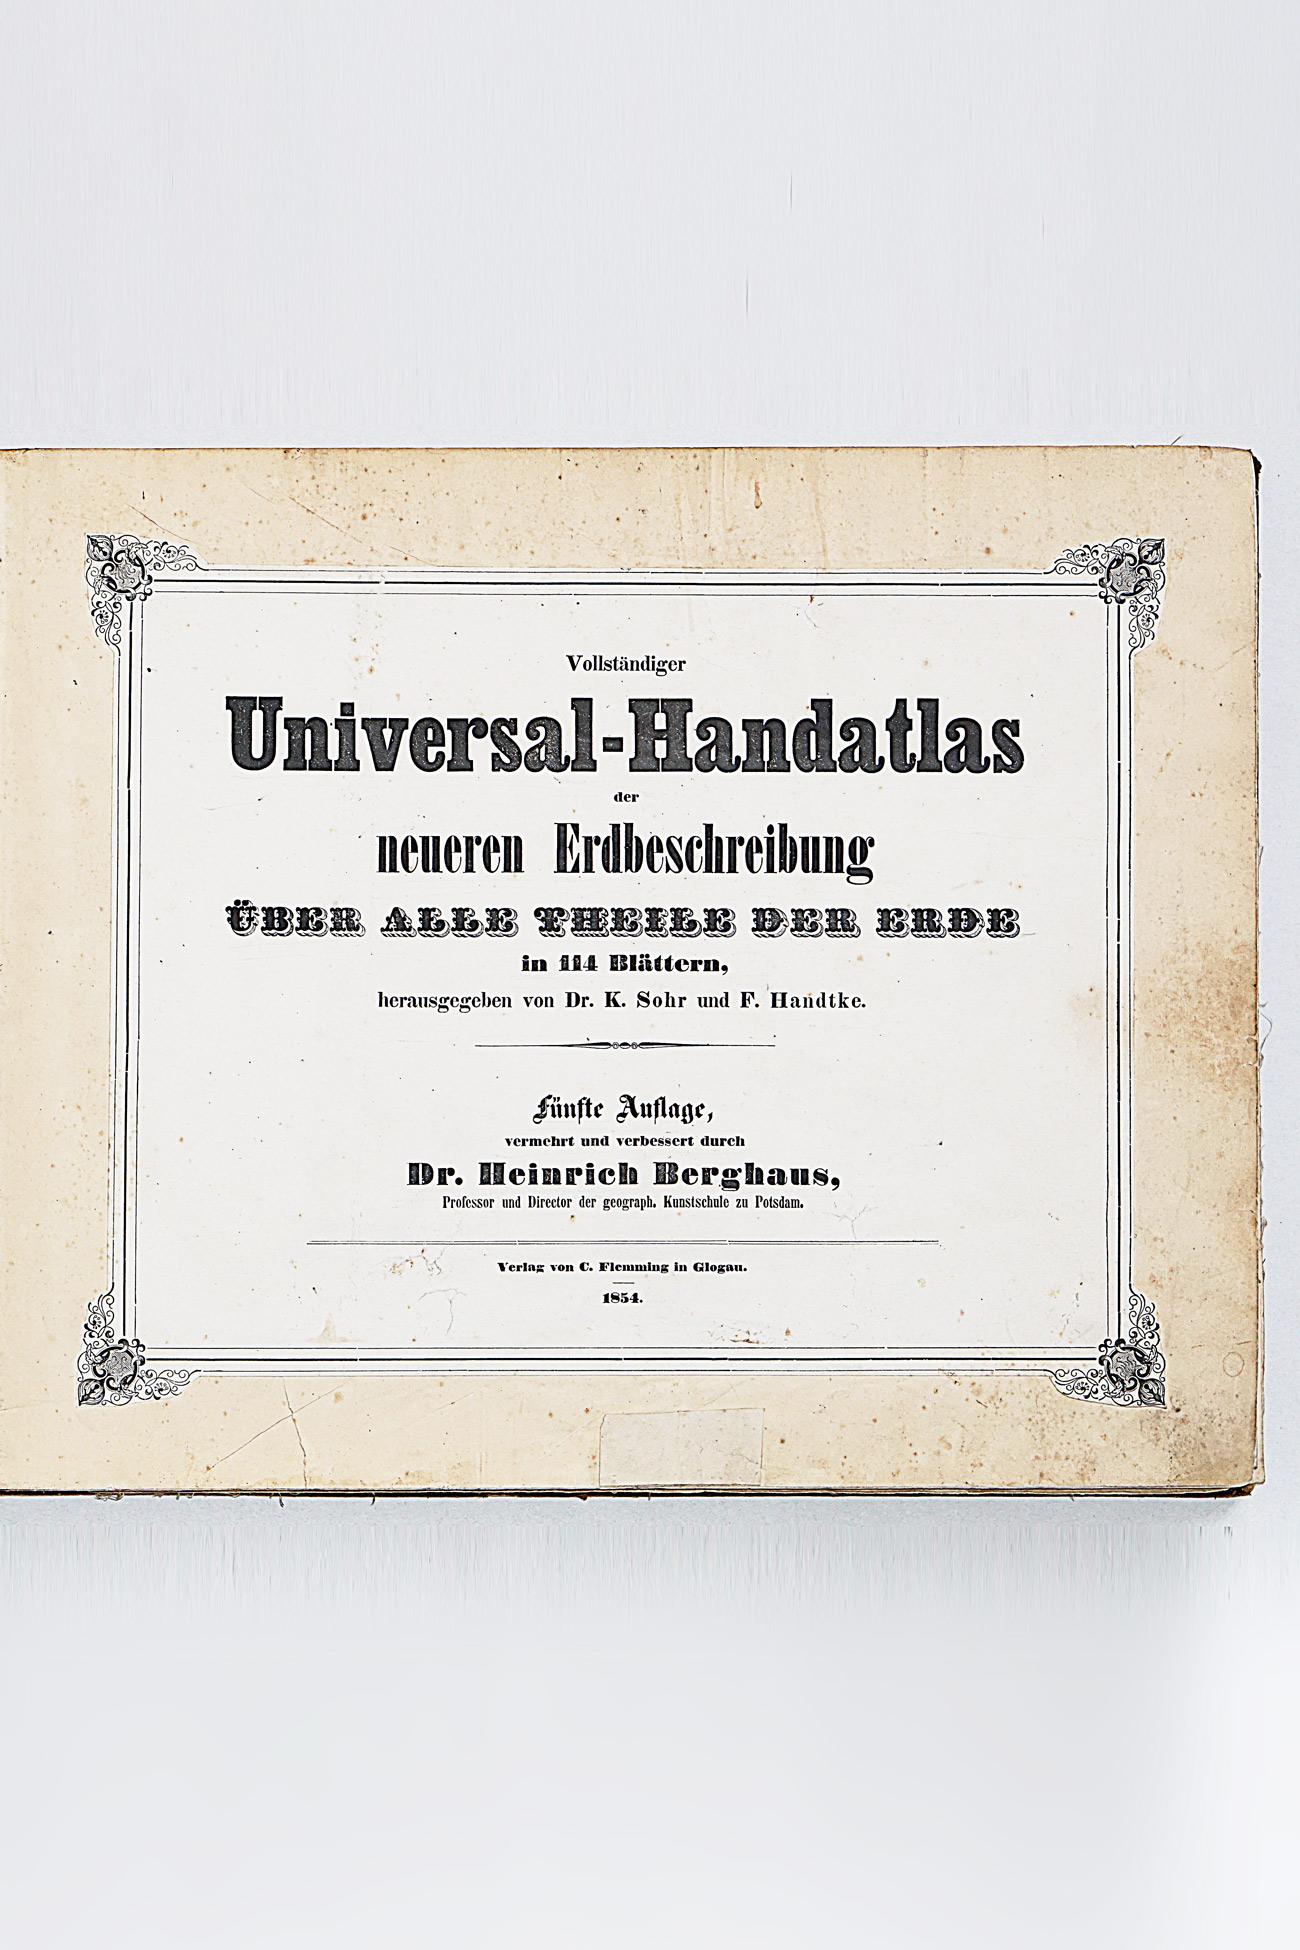 Vollstandiger Universal-Handatlas der Neueren Erdbeschreibung